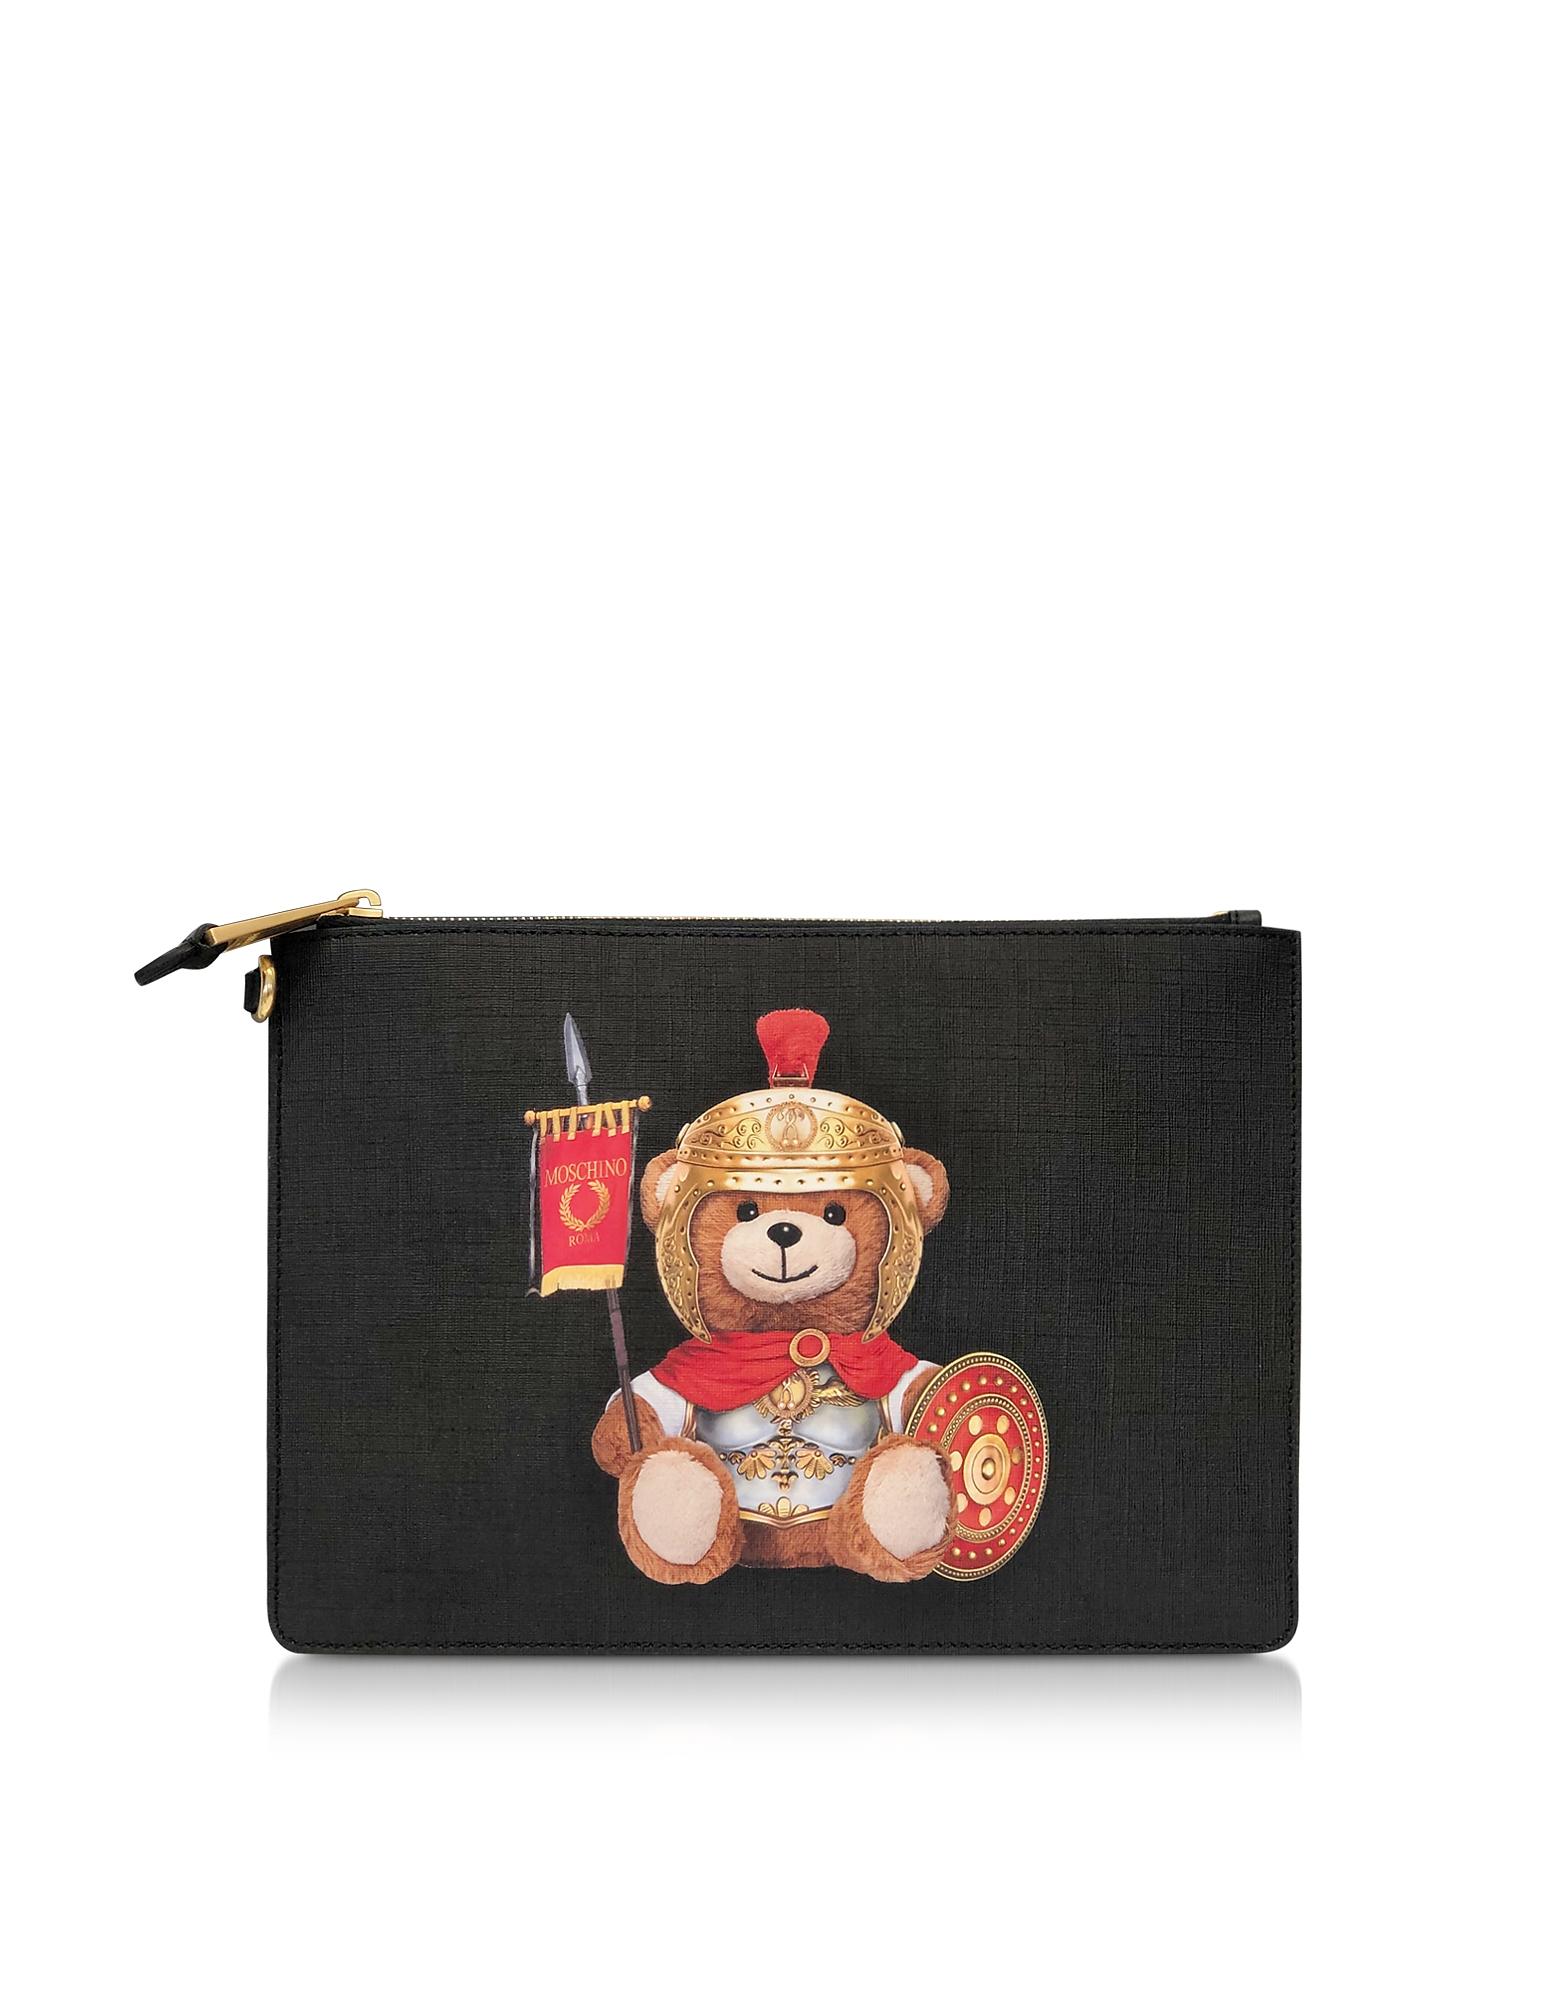 UPC 820771815005 product image for Moschino Designer Handbags, Roman Teddy Bear Flat Clutch w/Wristlet | upcitemdb.com